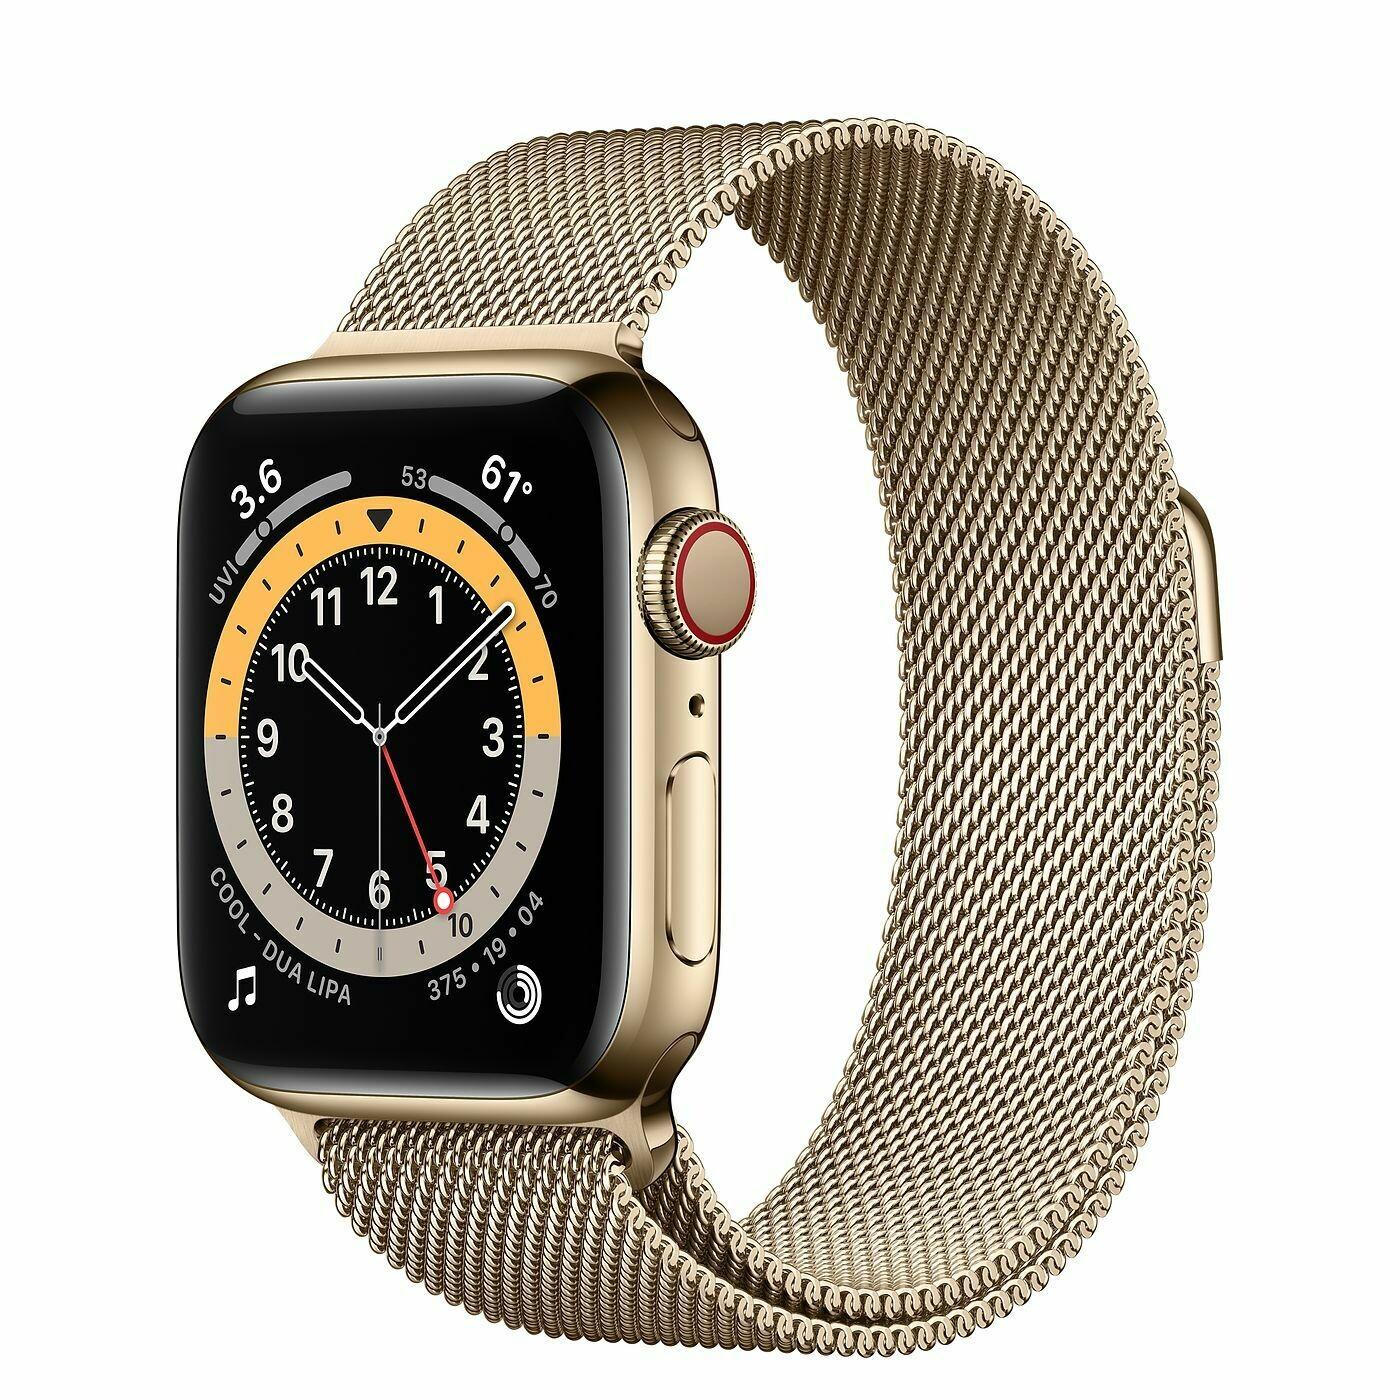 Часы Apple Watch Series 6 GPS + Cellular 40mm Stainless Steel Case with Milanese Loop (Золотистый)